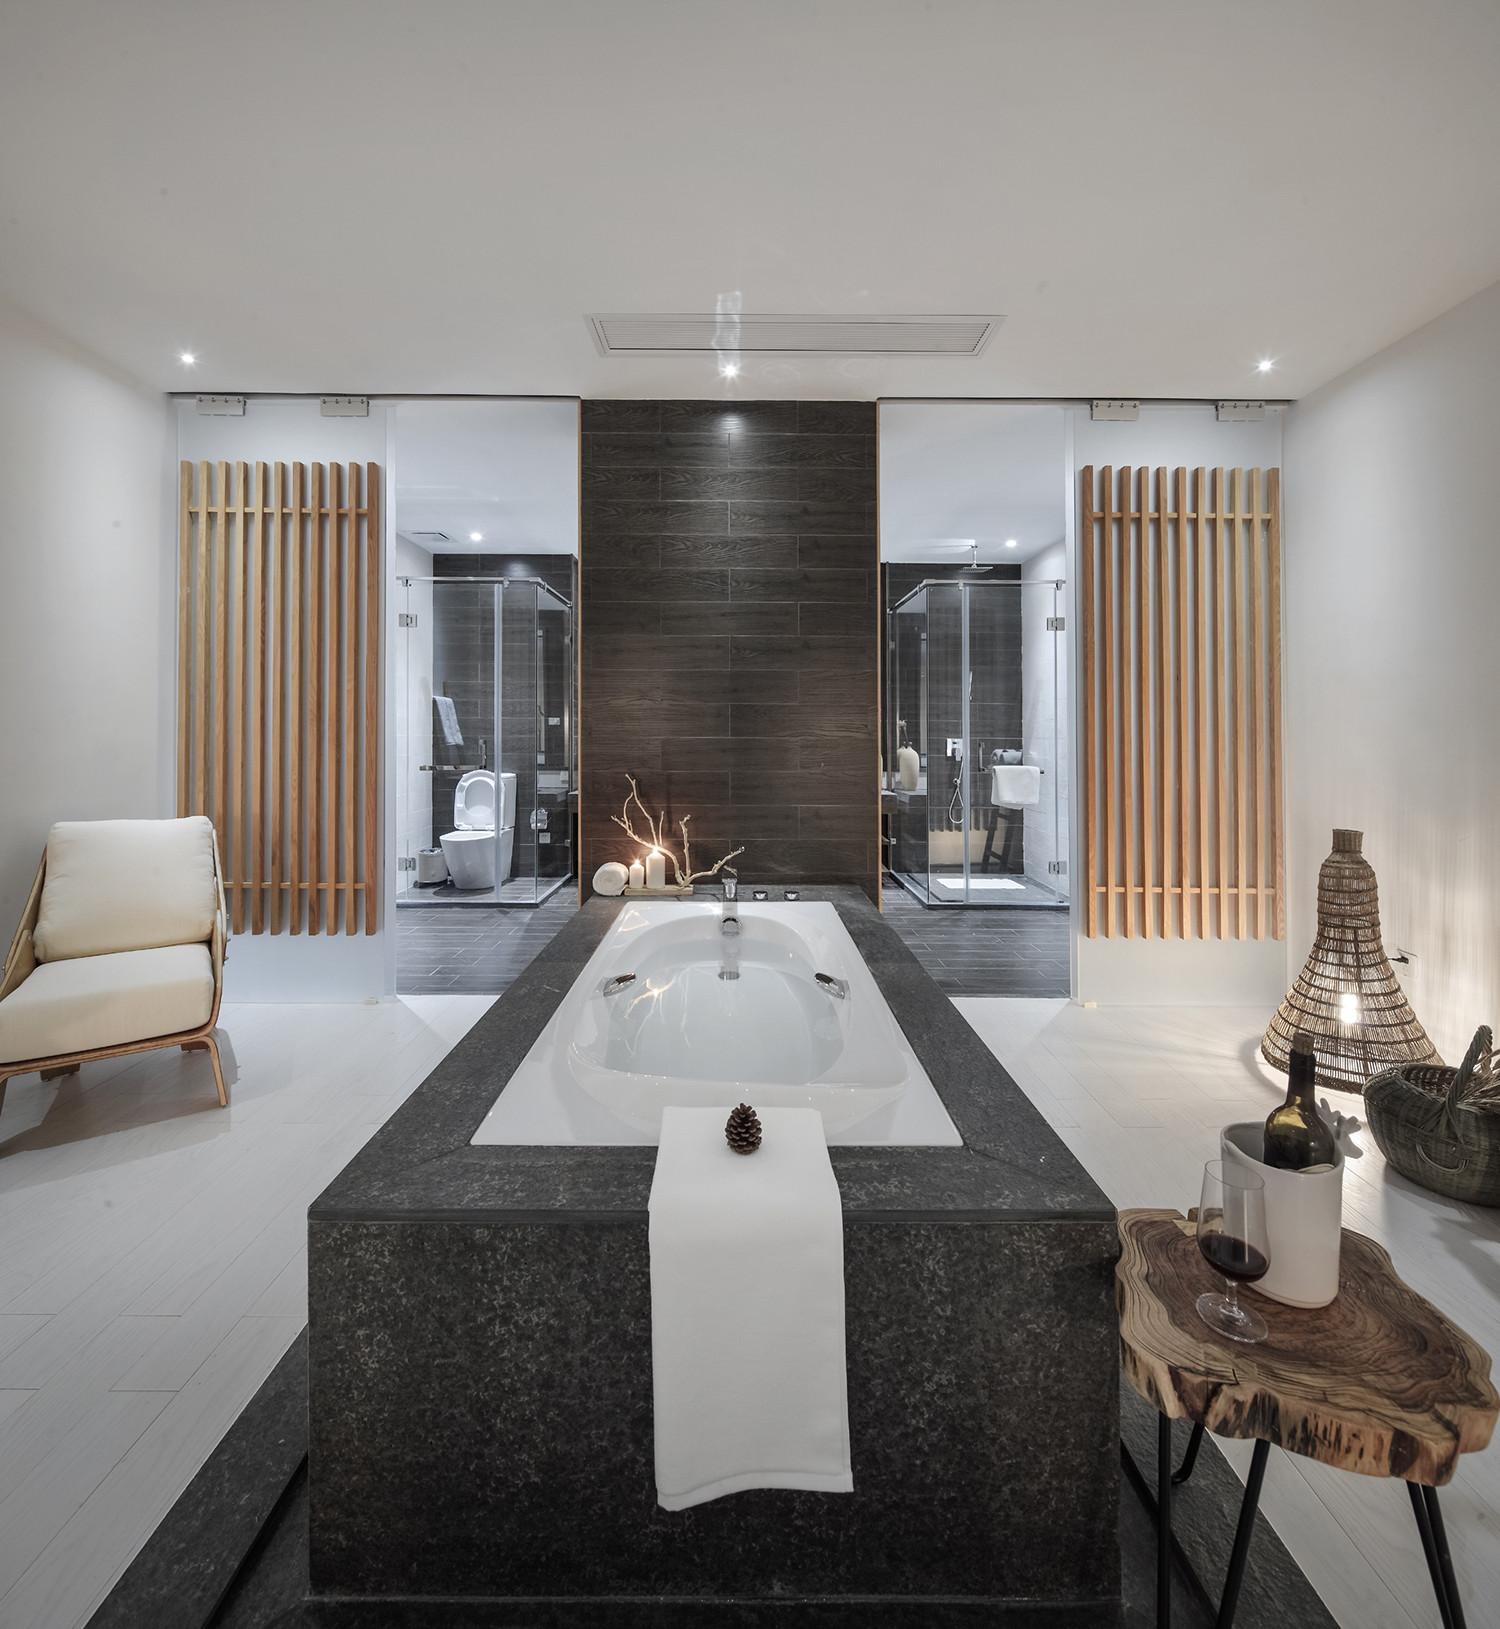 Ripple Hotel - Qiandao Lake design brief Hisheji (97)